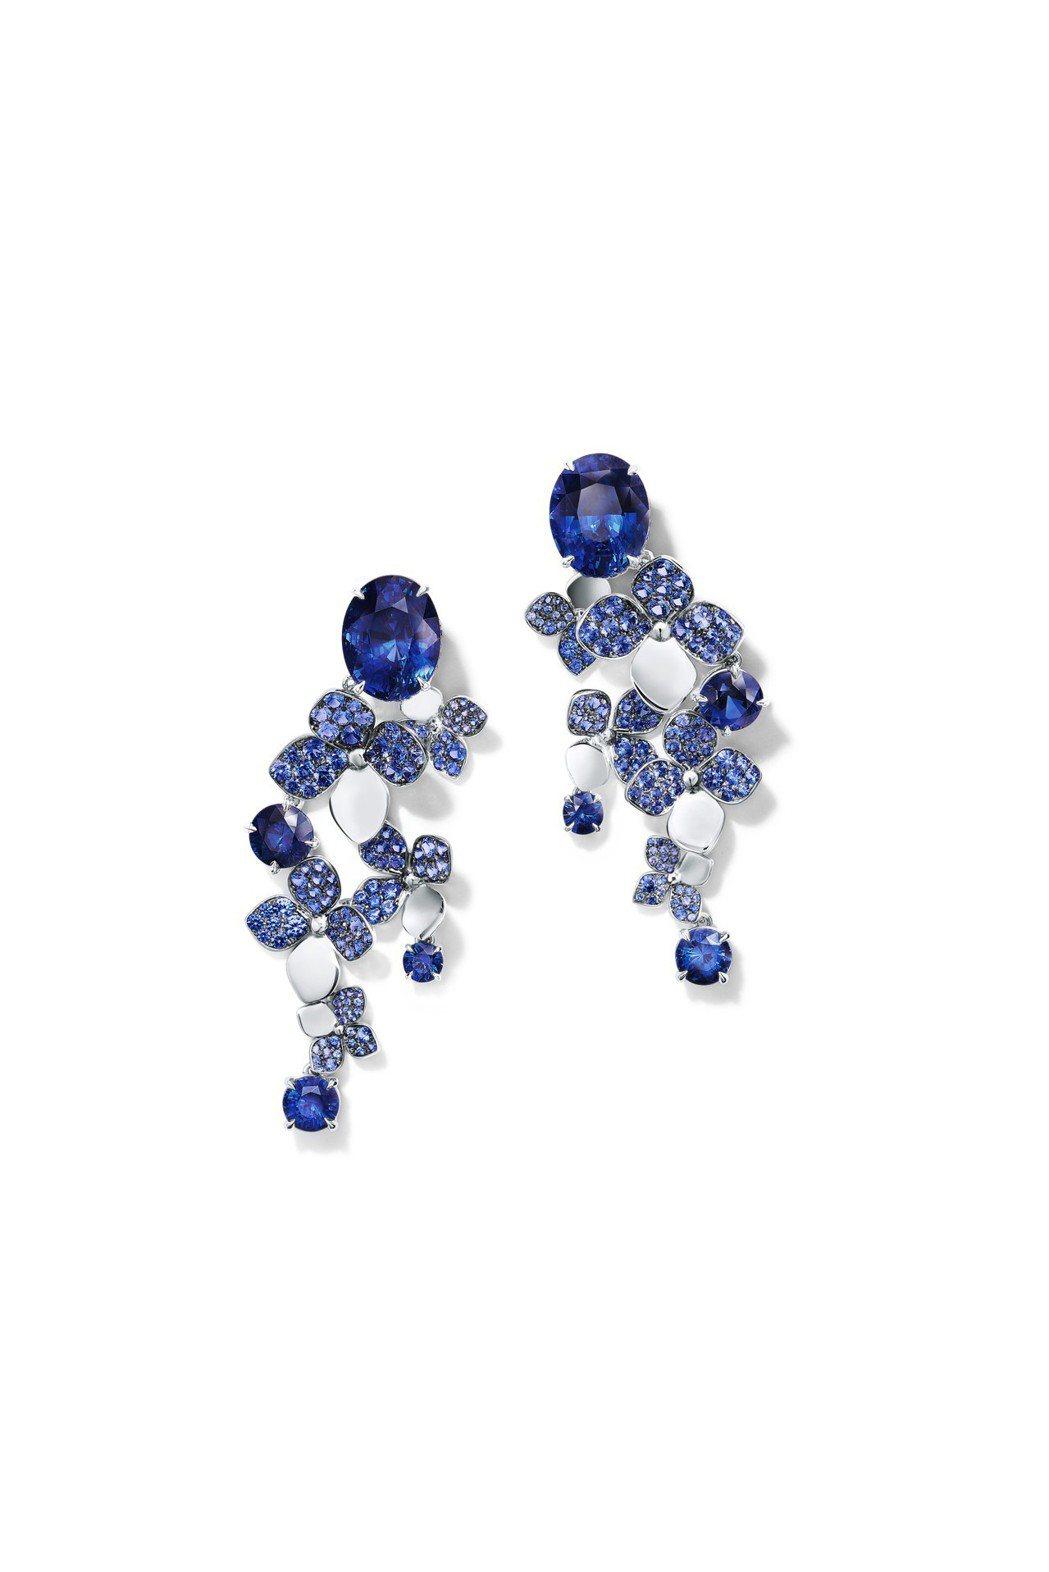 Tiffany 2018 Blue Book系列春季主題,鉑金鑲嵌逾18克拉圓形...